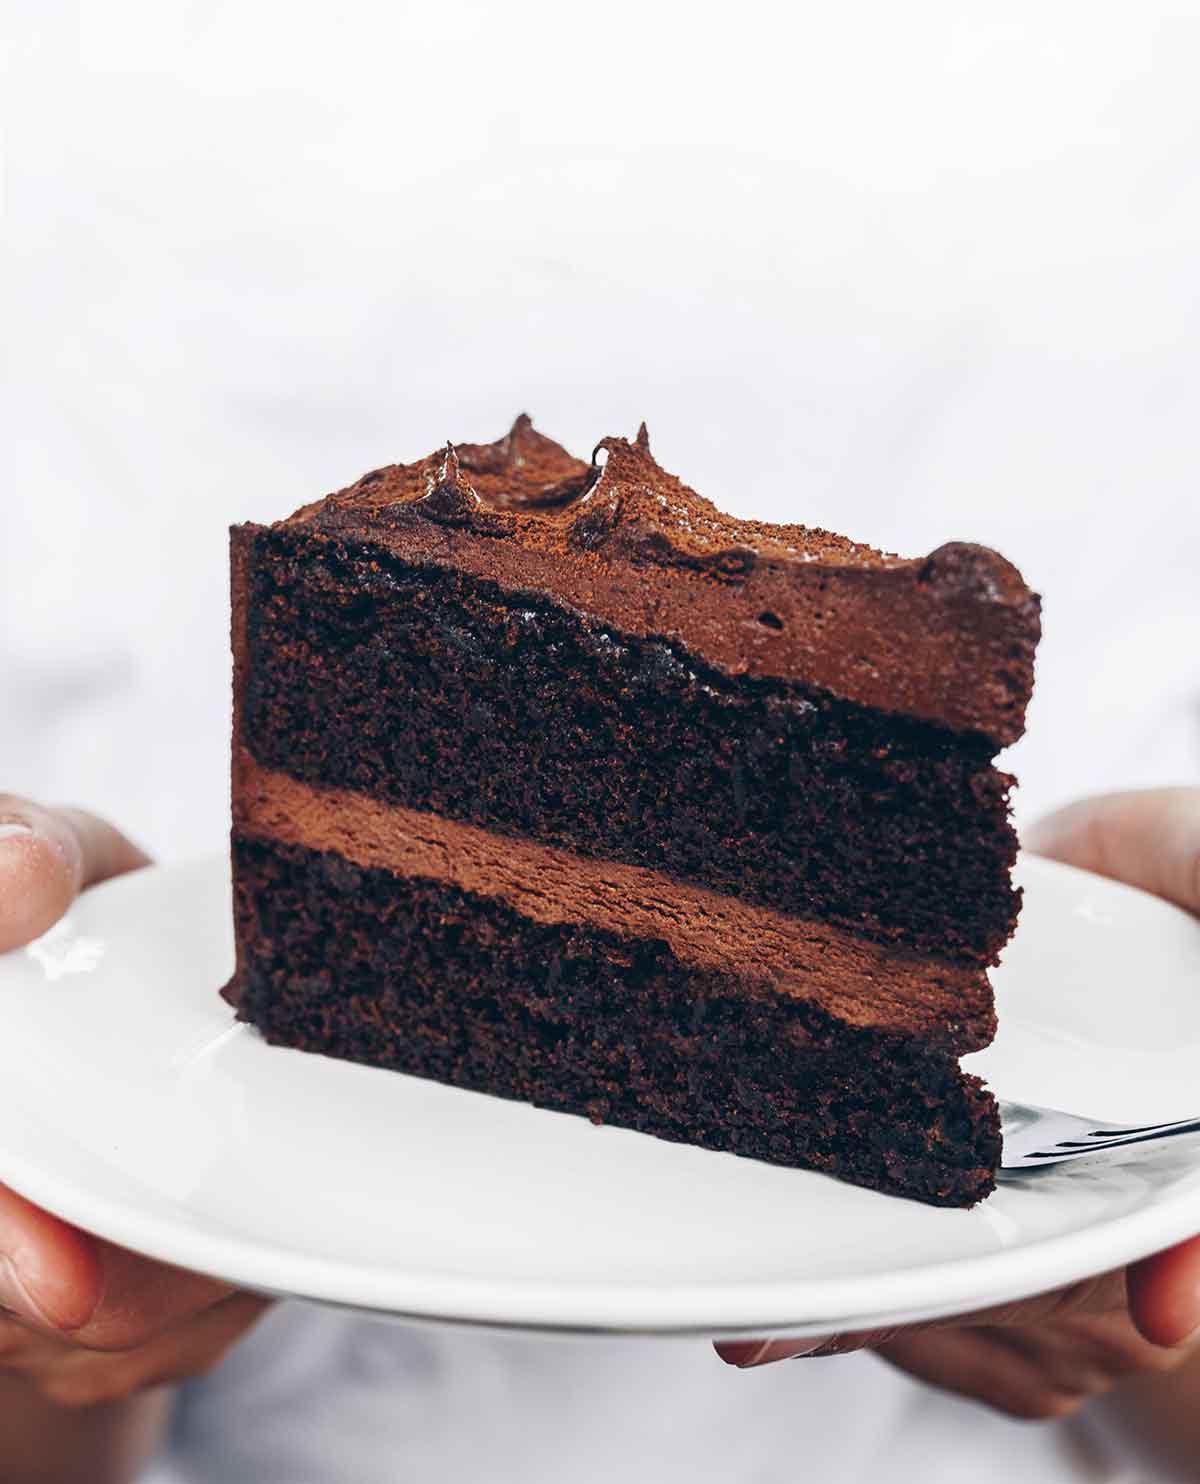 Basic Chocolate Cake Recipe | Leite's Culinaria